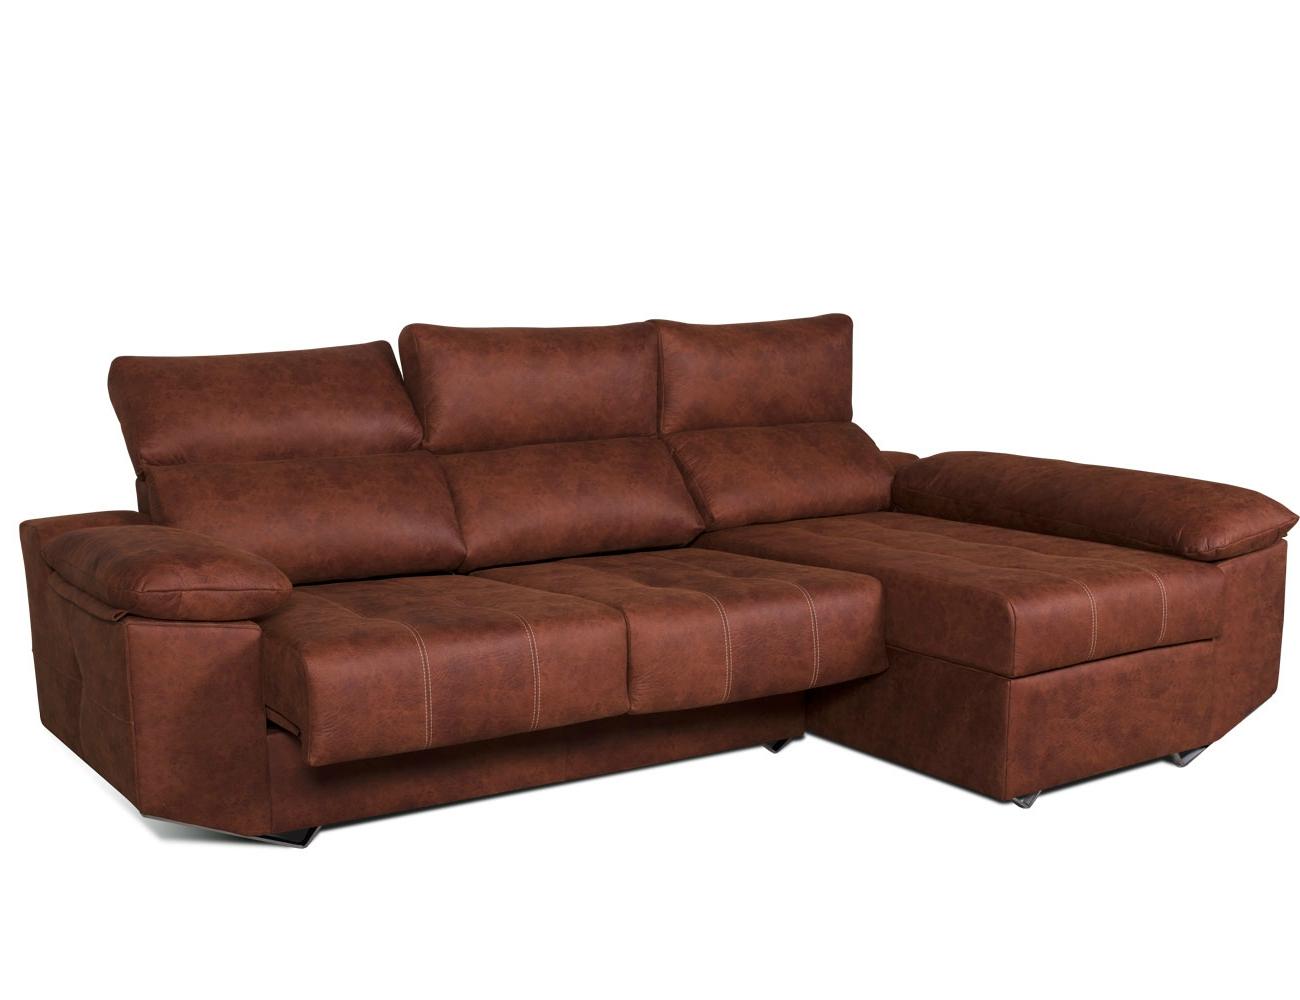 Sofa chaiselongue moderno patas forma tejido anti manchas